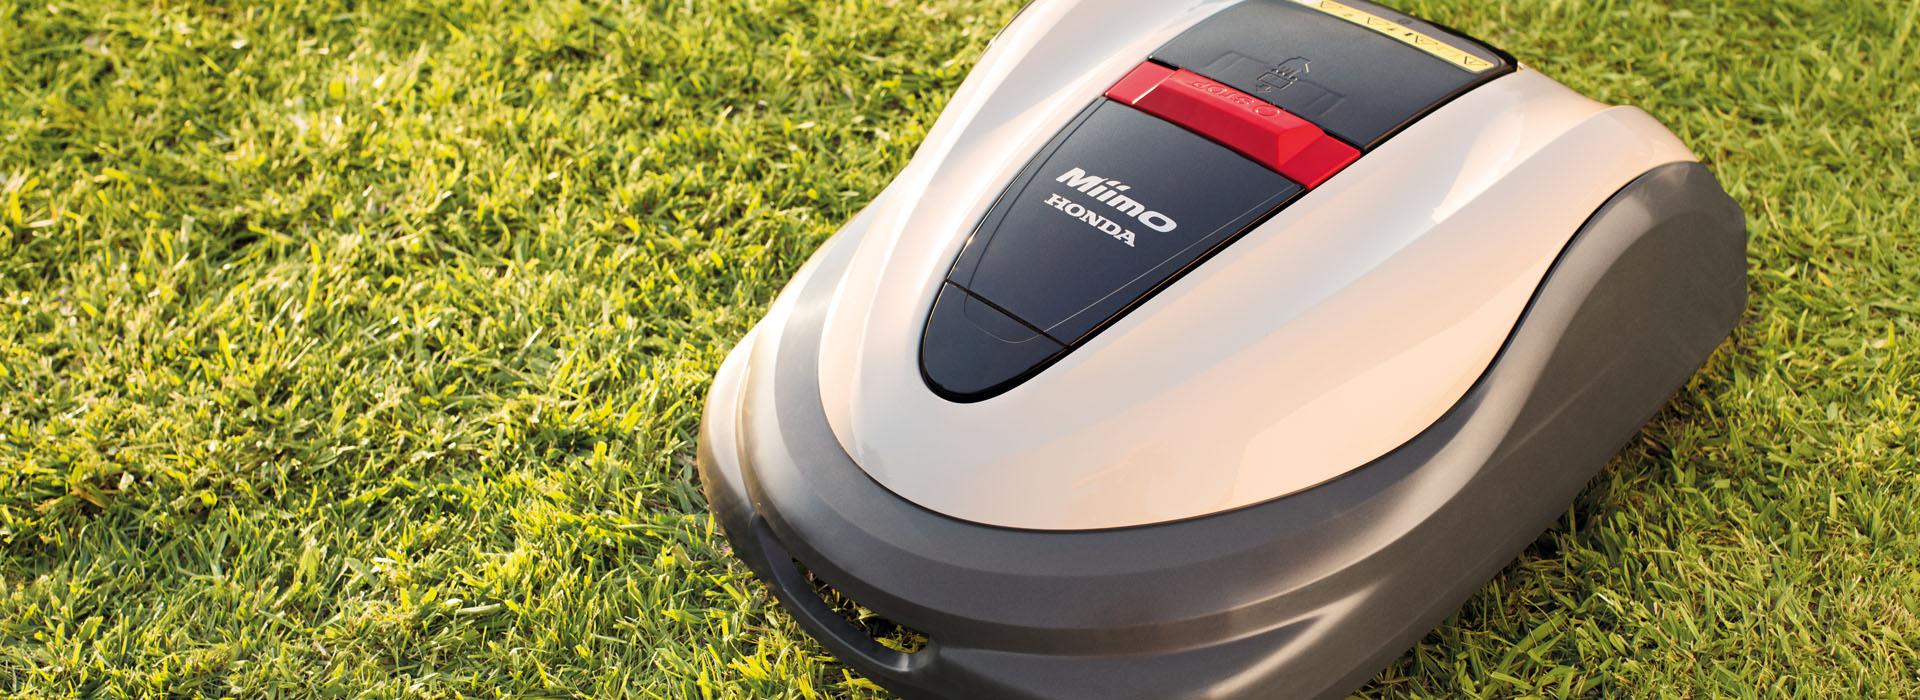 Boerger-Motorgeraete-Honda-MIIMO-Rasenroboter-FAQ